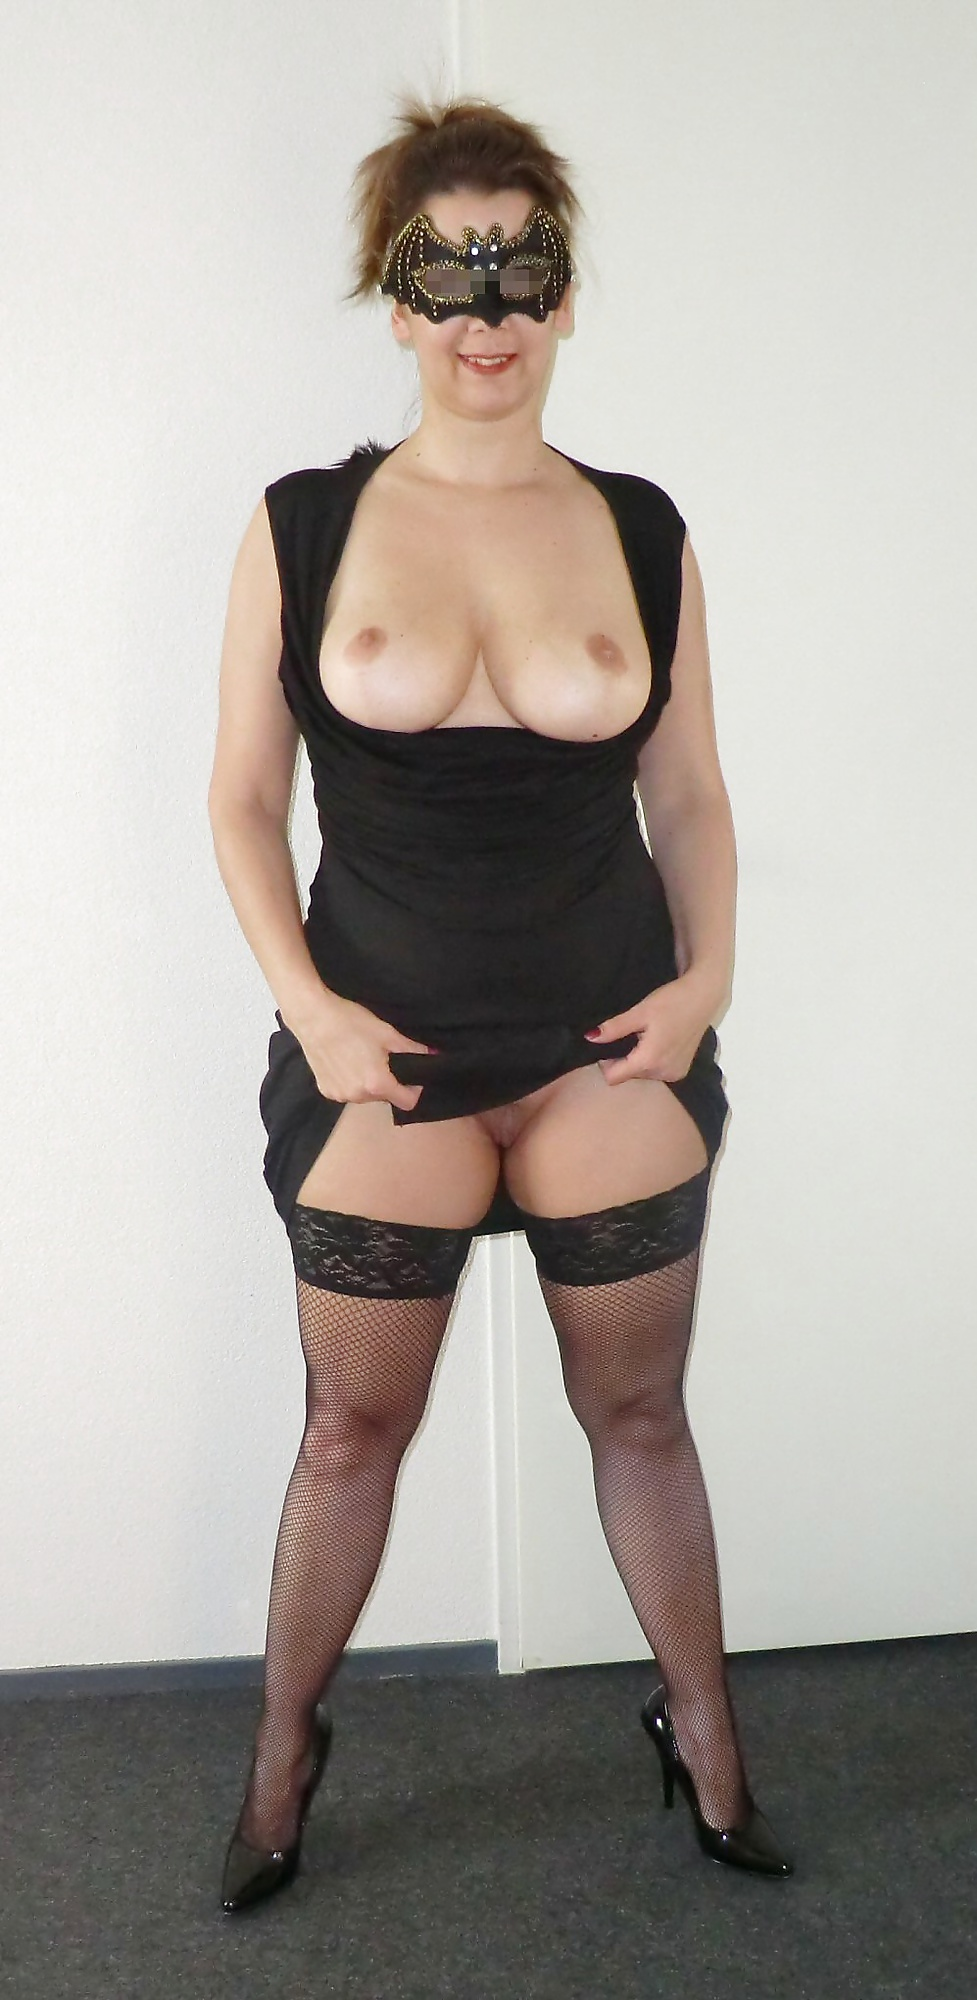 Dicke Titten in gratis Bildern